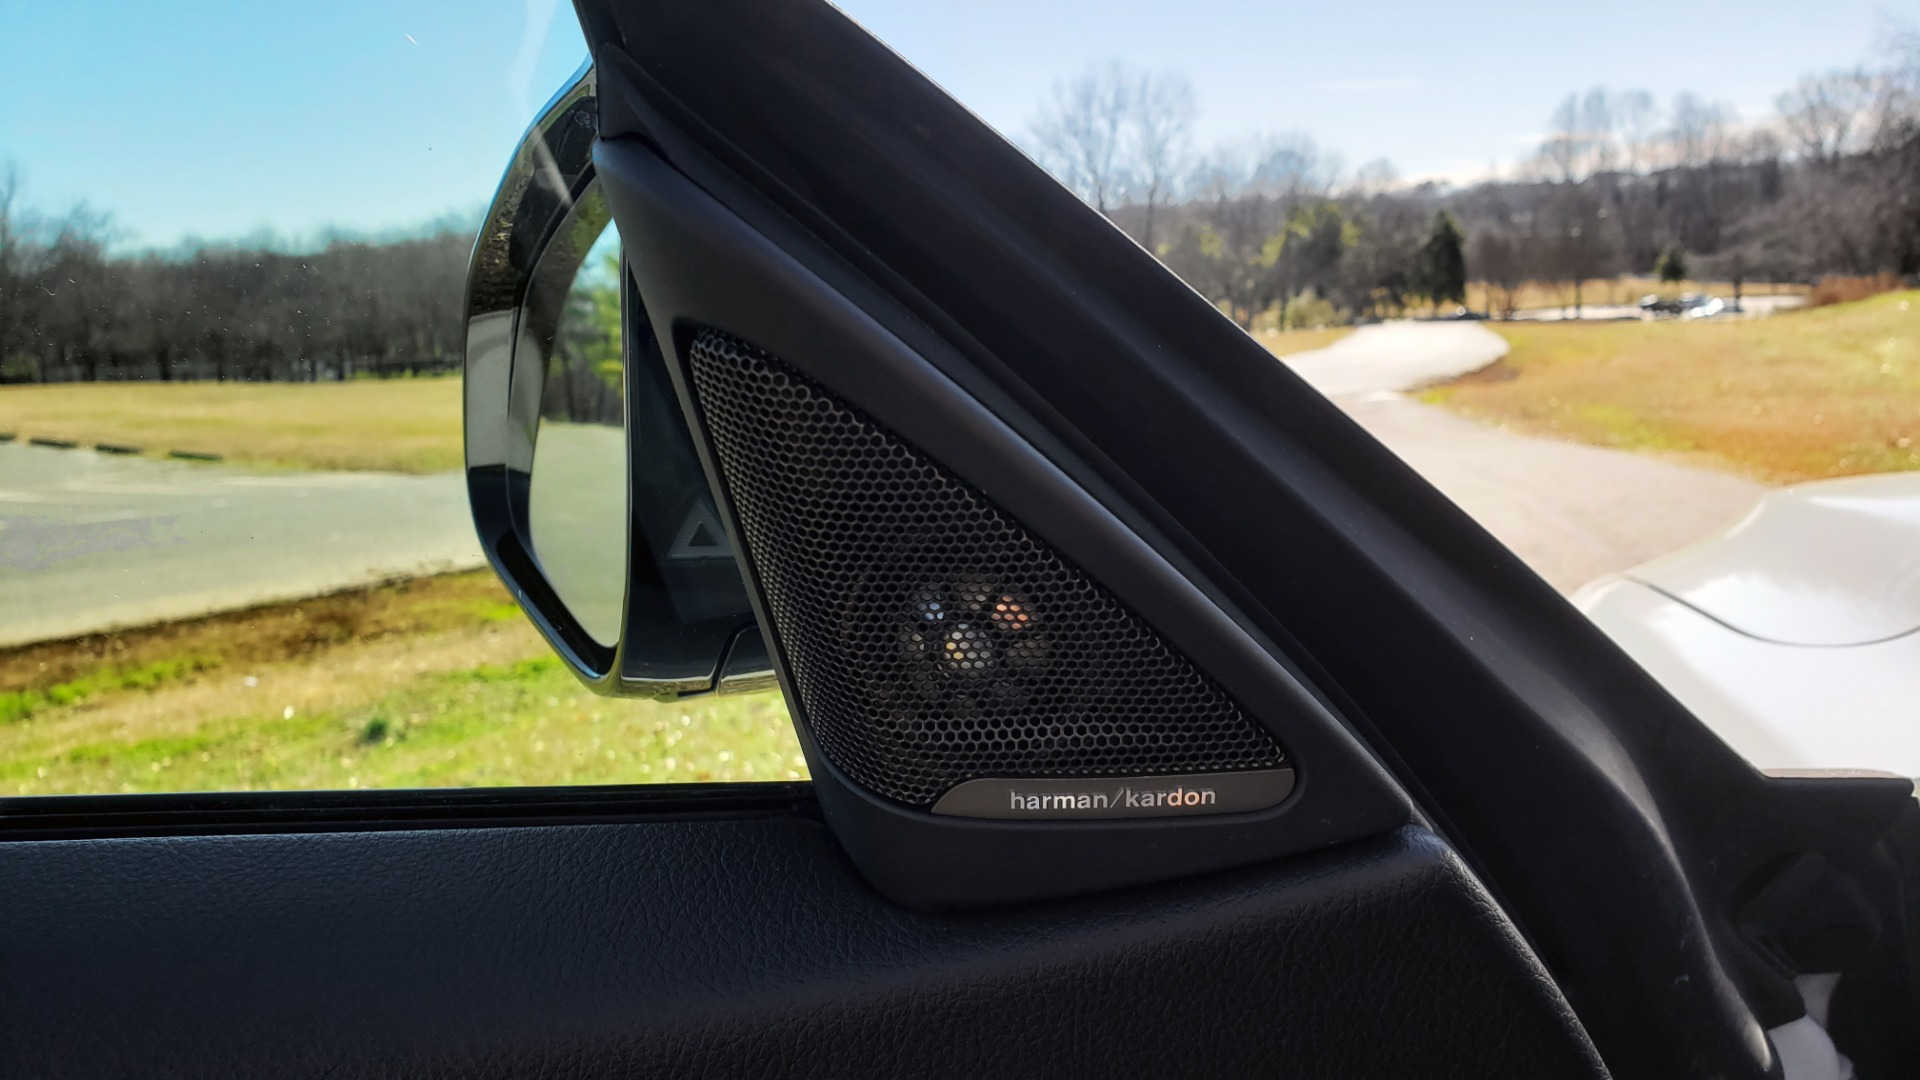 Used 2018 BMW M4 COMP PKG / EXEC / M-DRIVER / PARK CNTRL / ACTIVE BLIND SPOT for sale Sold at Formula Imports in Charlotte NC 28227 35